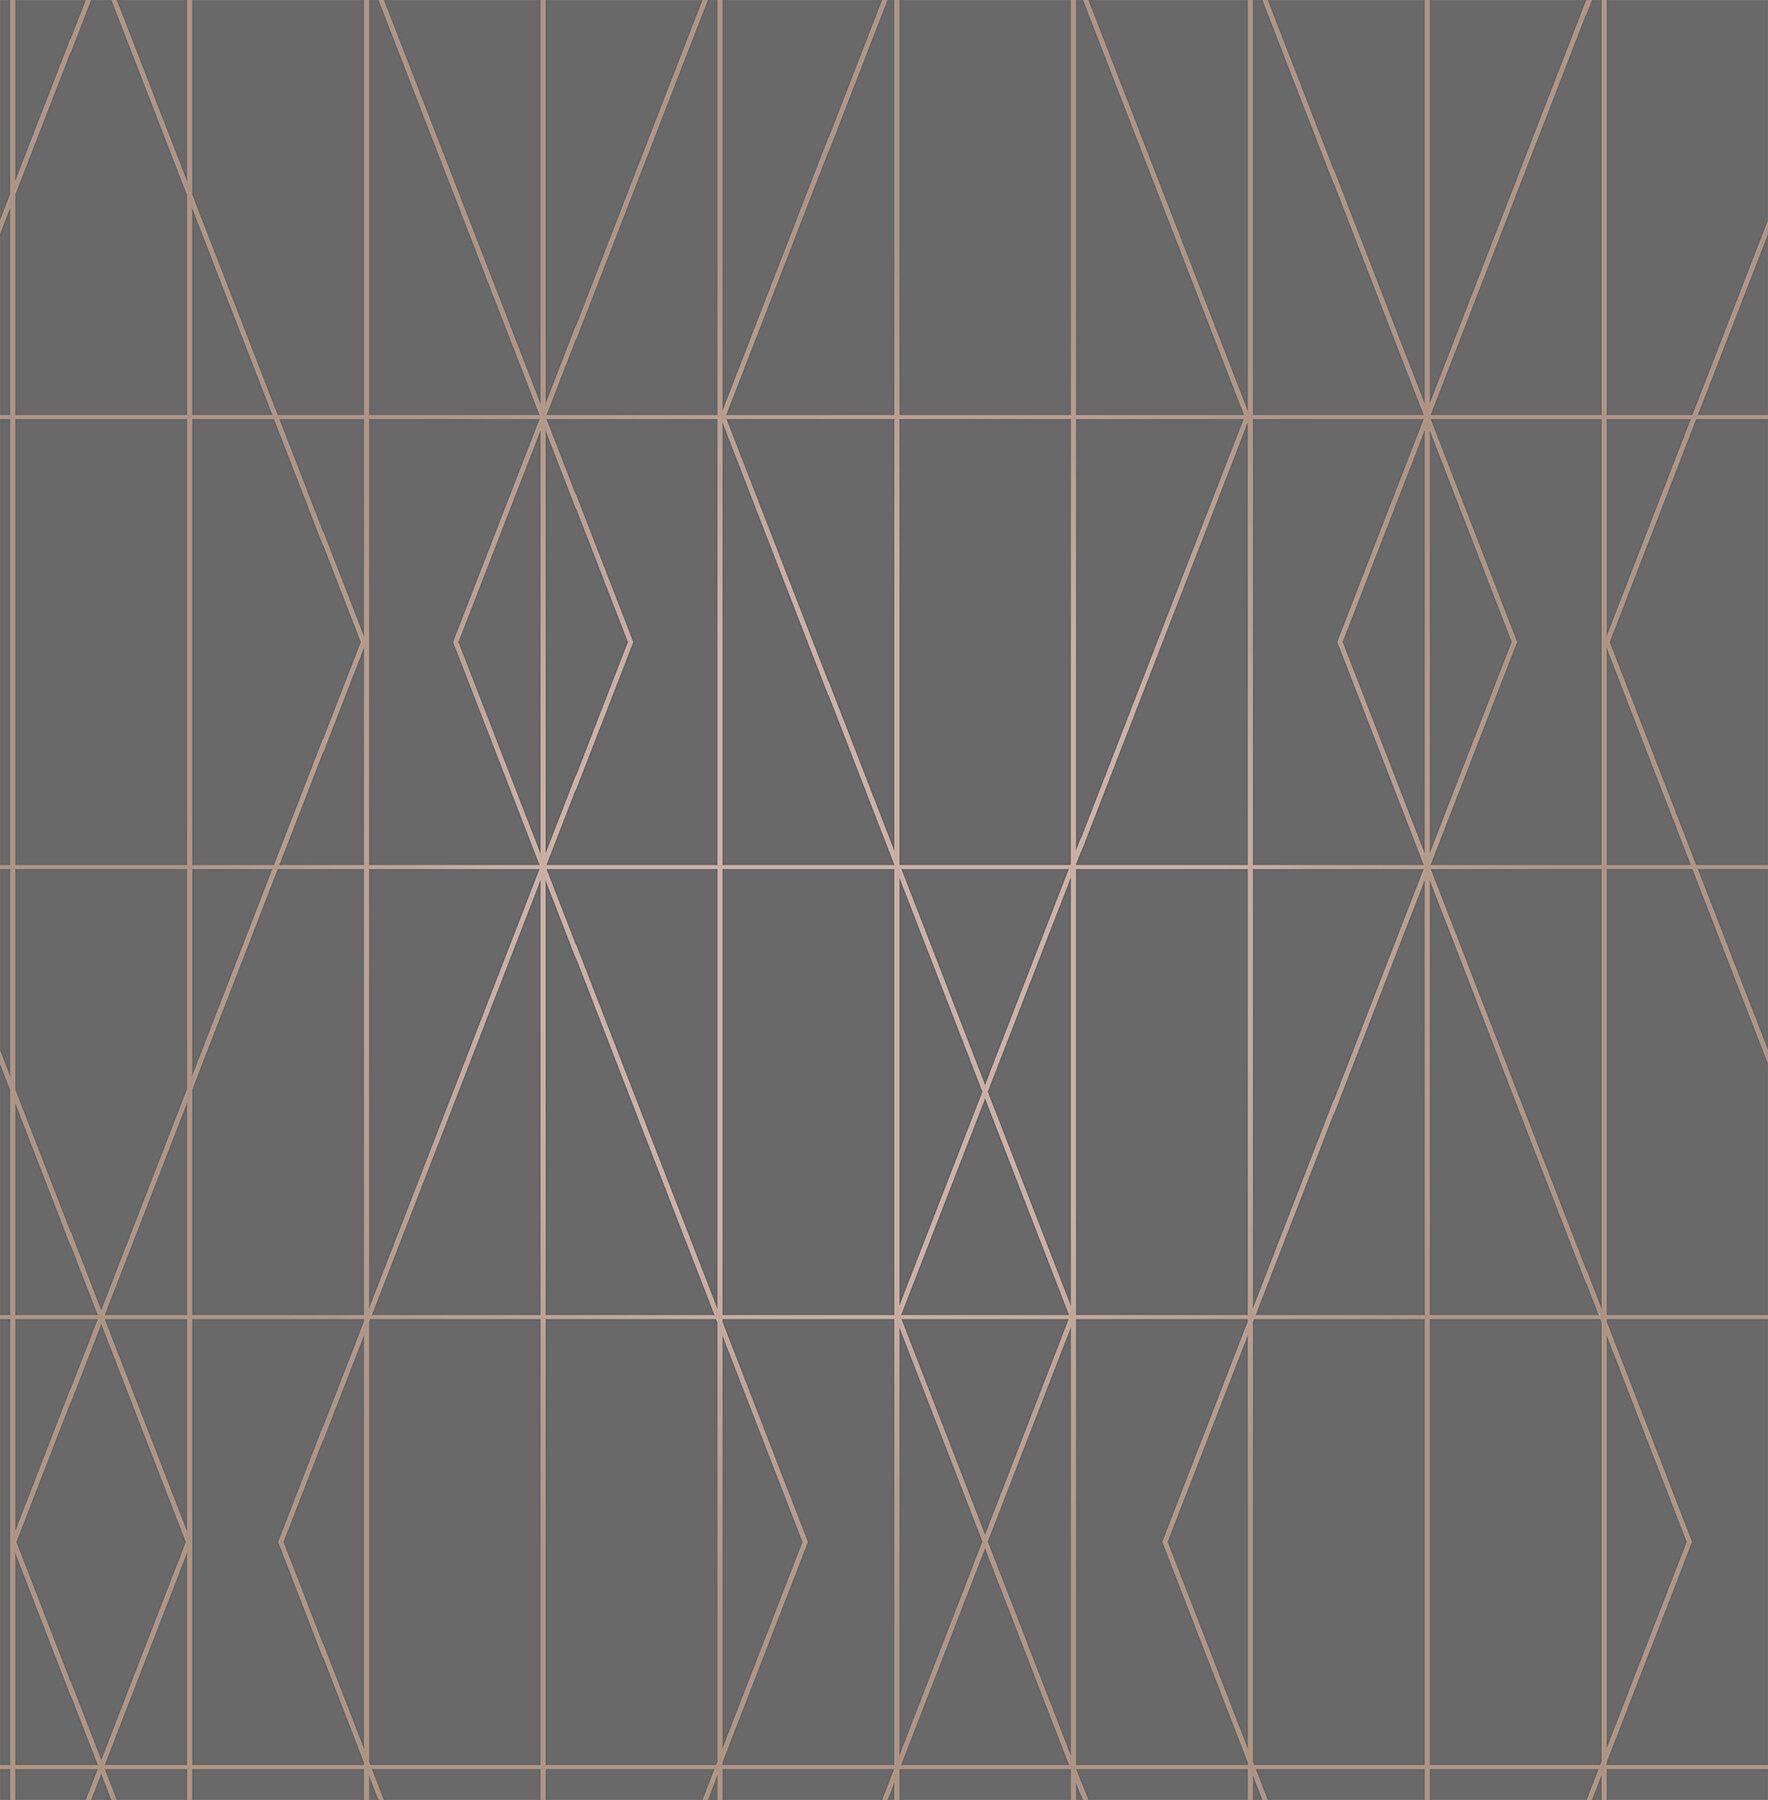 Paper Geometric Wallpaper Youll Love Wayfaircouk